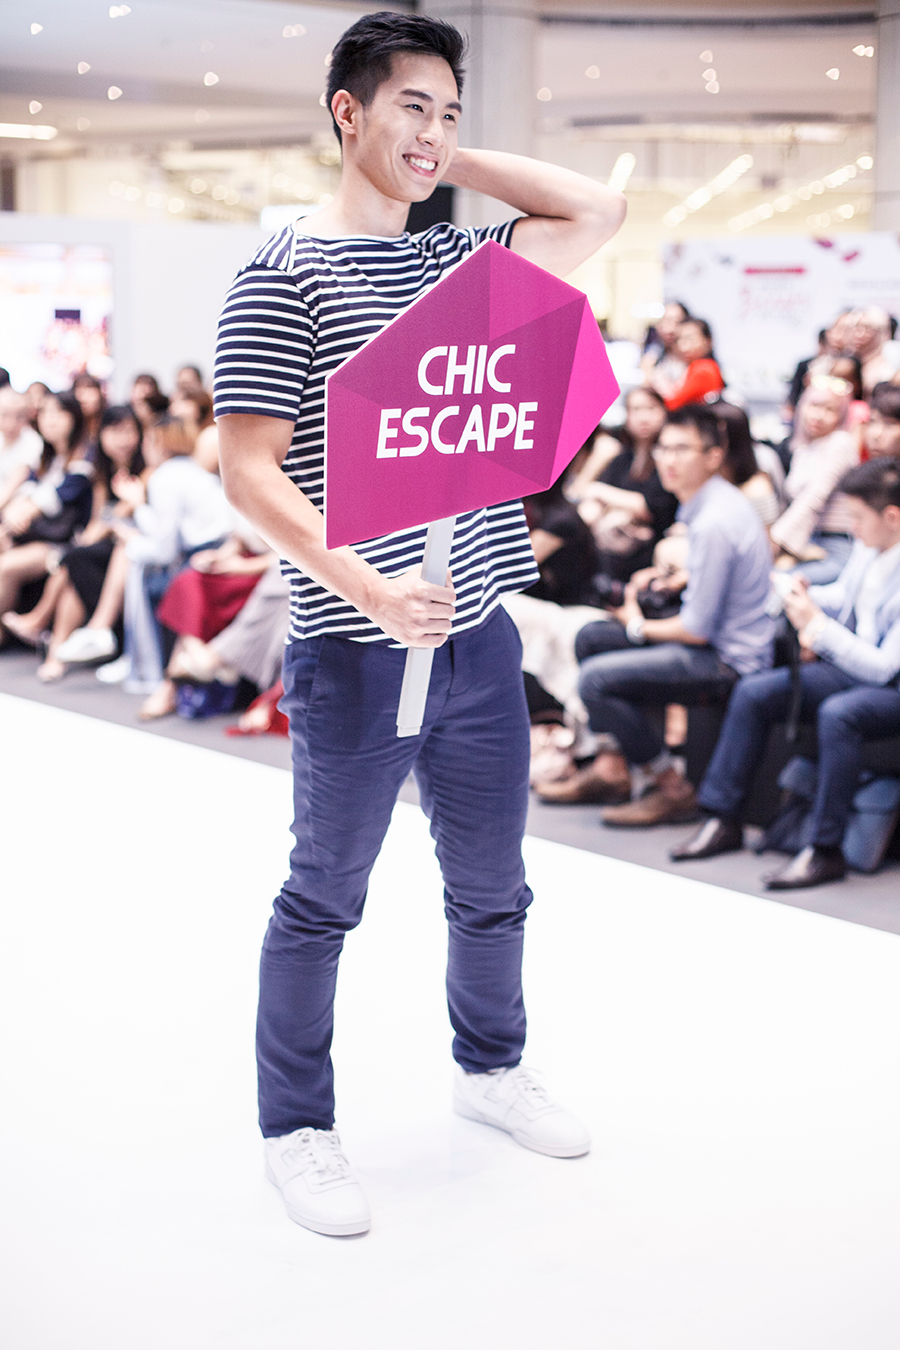 Chic Escape Catwalk at Clozette Style Party 2016 in Suntec City. #ClozetteStyleParty